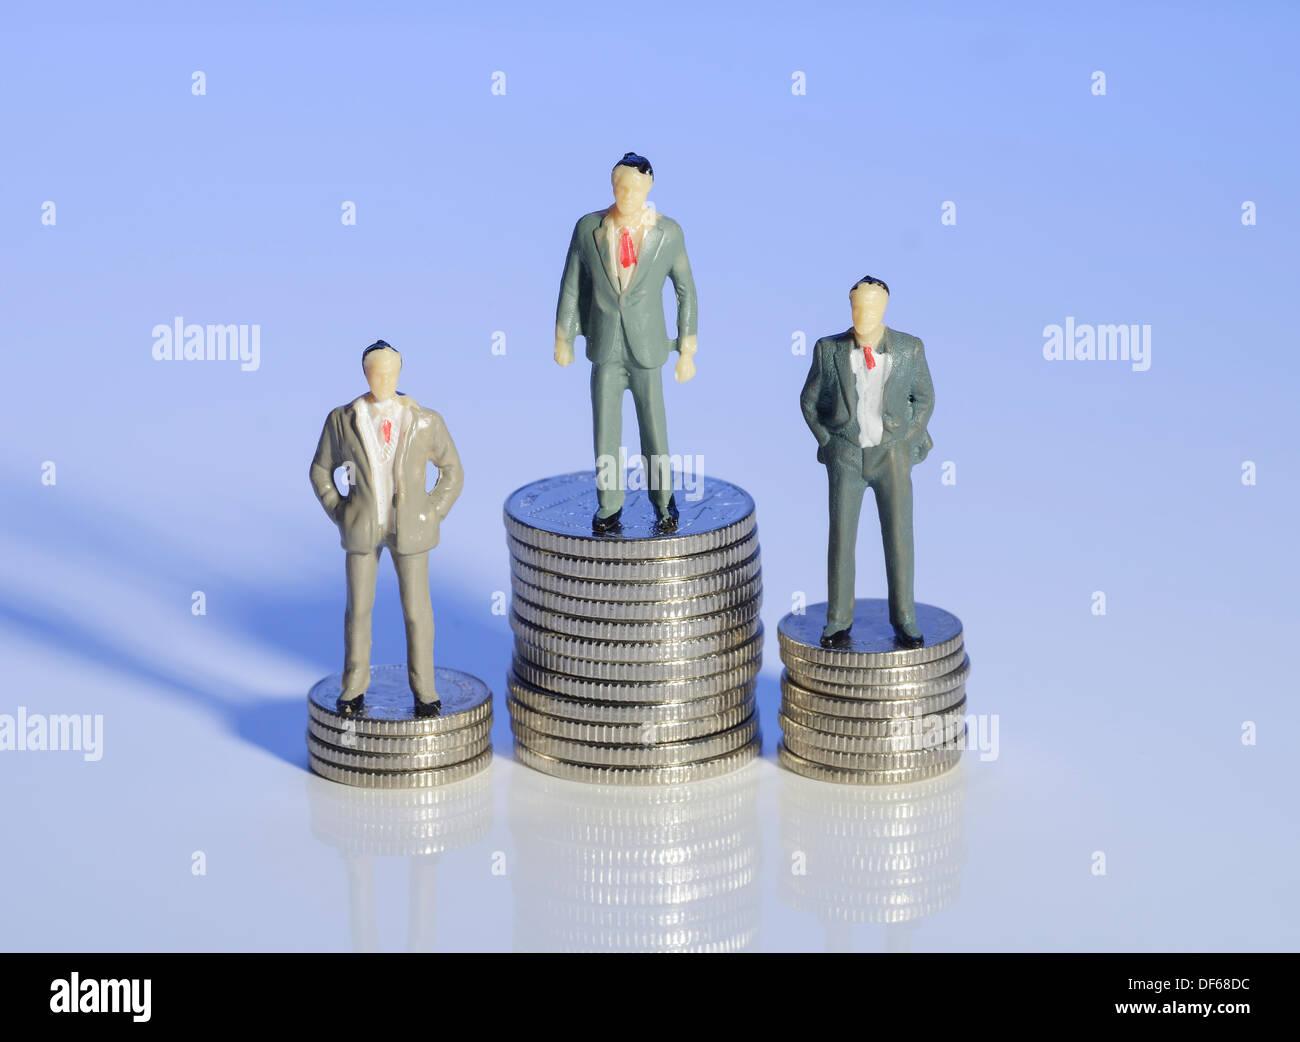 Mini plastic business men standing on piles of money - Stock Image